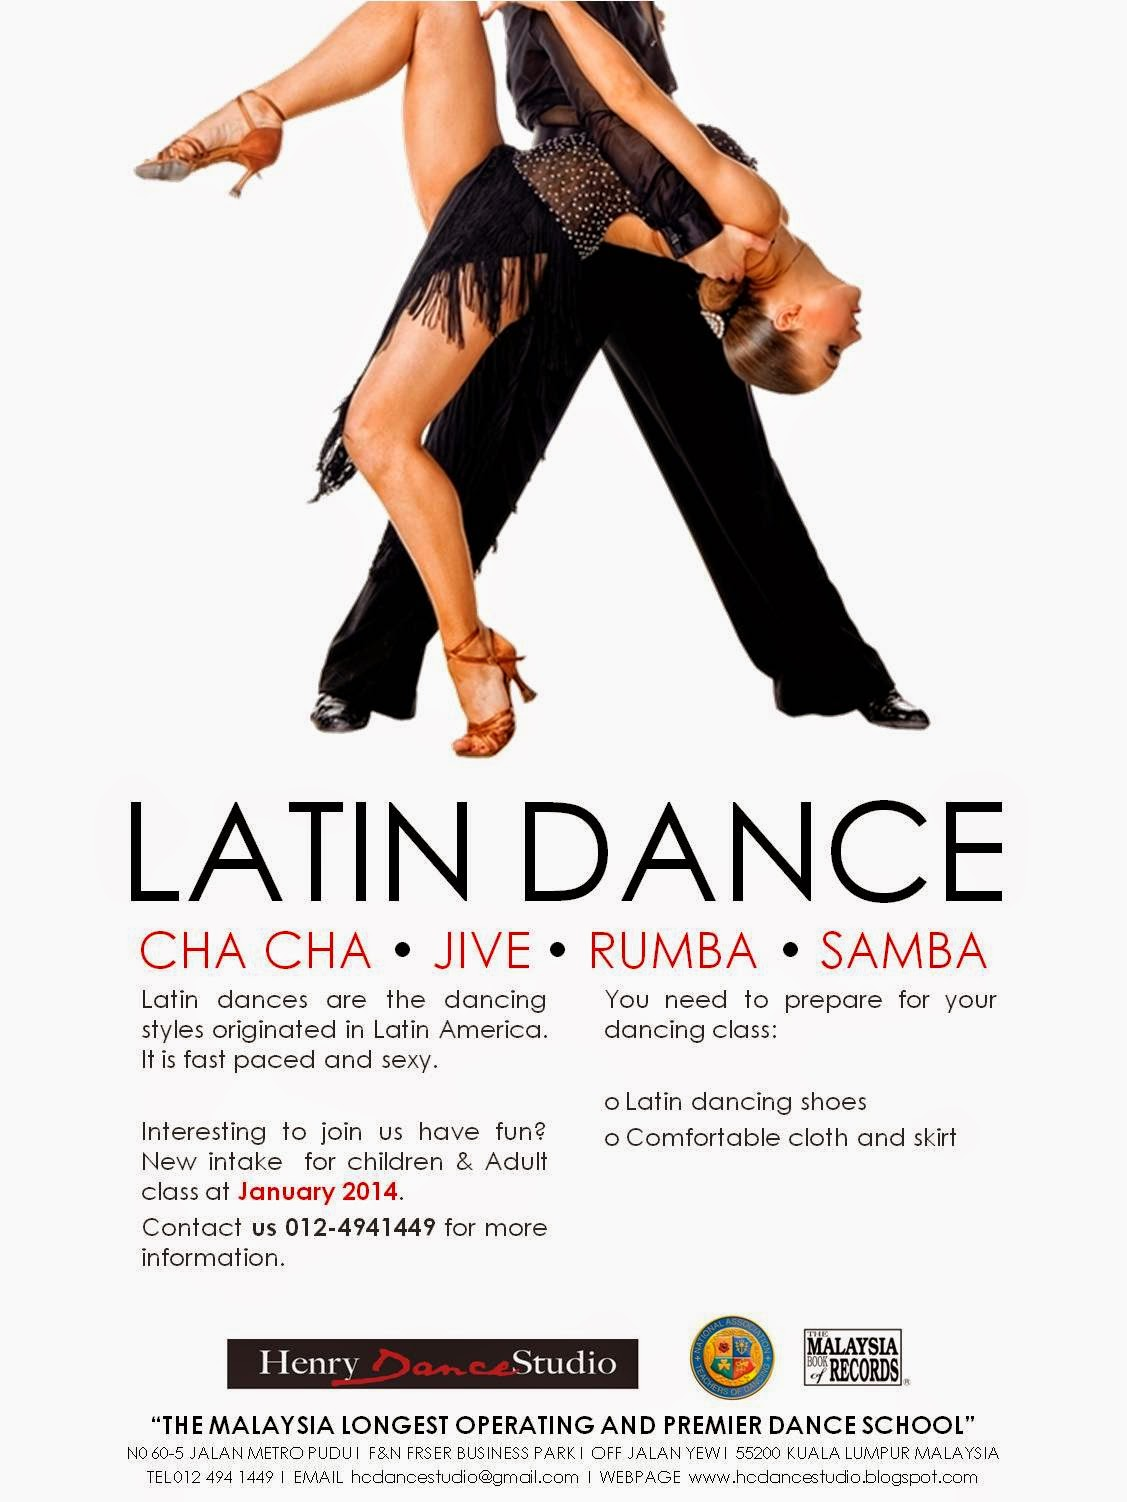 Class Schedules: Henry Dance Studio Class Schedule